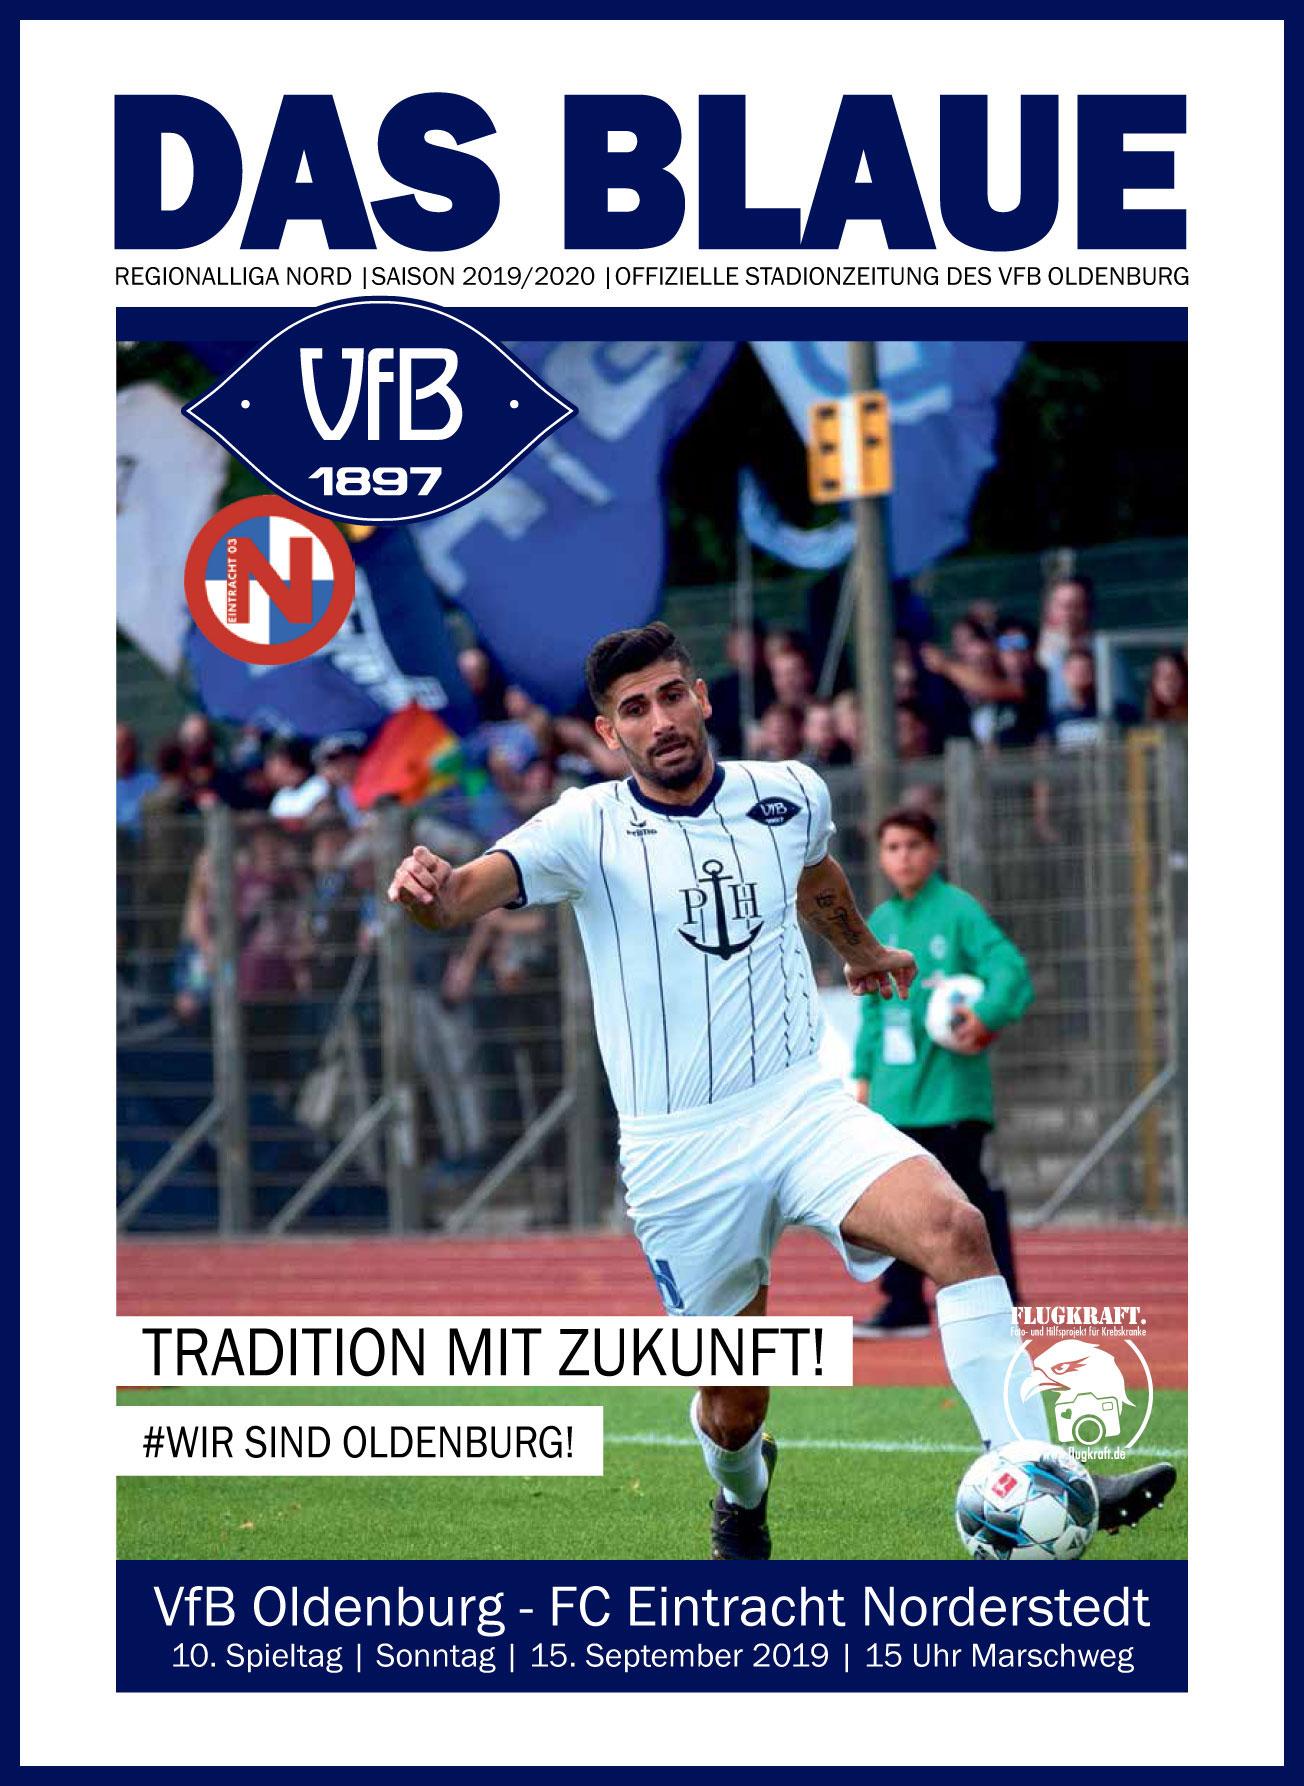 https://vfb-oldenburg.de/wp-content/uploads/VFB_Oldenburg_10_Spieltag_2019_2020-1-1.jpg